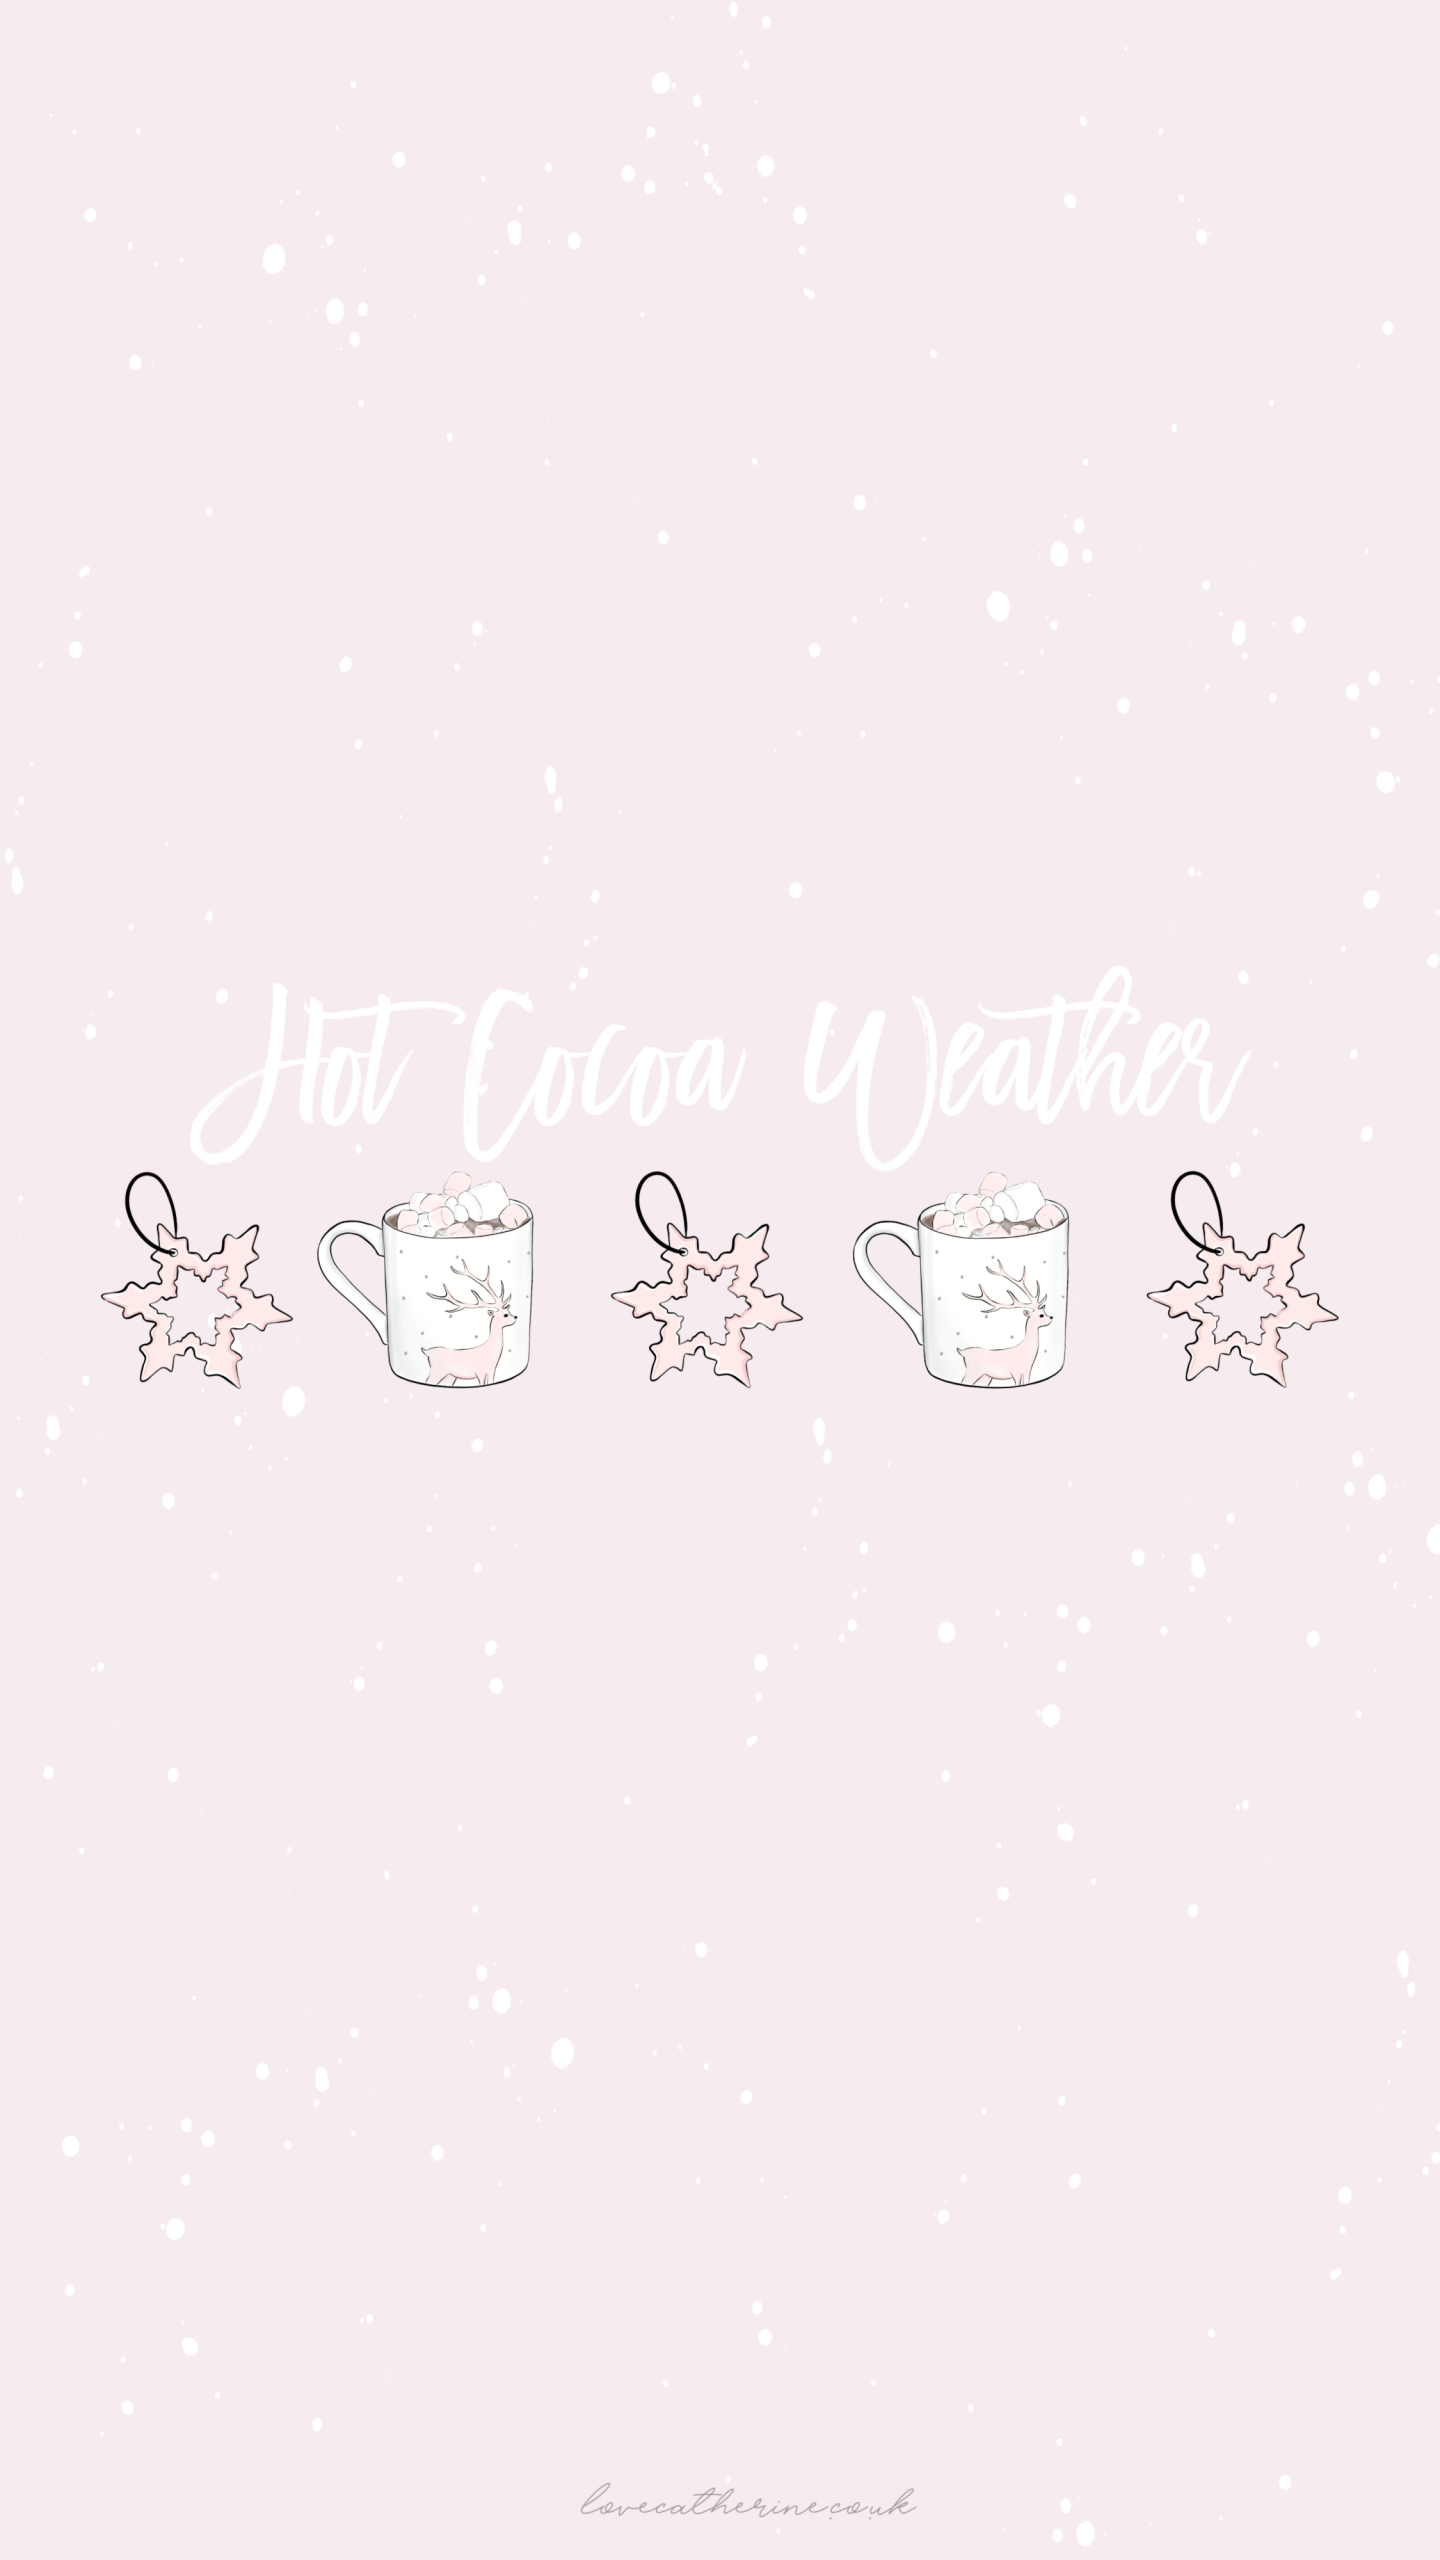 Free Cute Girly Winter Phone Wallpapers For Christmas Cute Christmas Wallpaper Winter Wallpaper Winter Wonderland Wallpaper